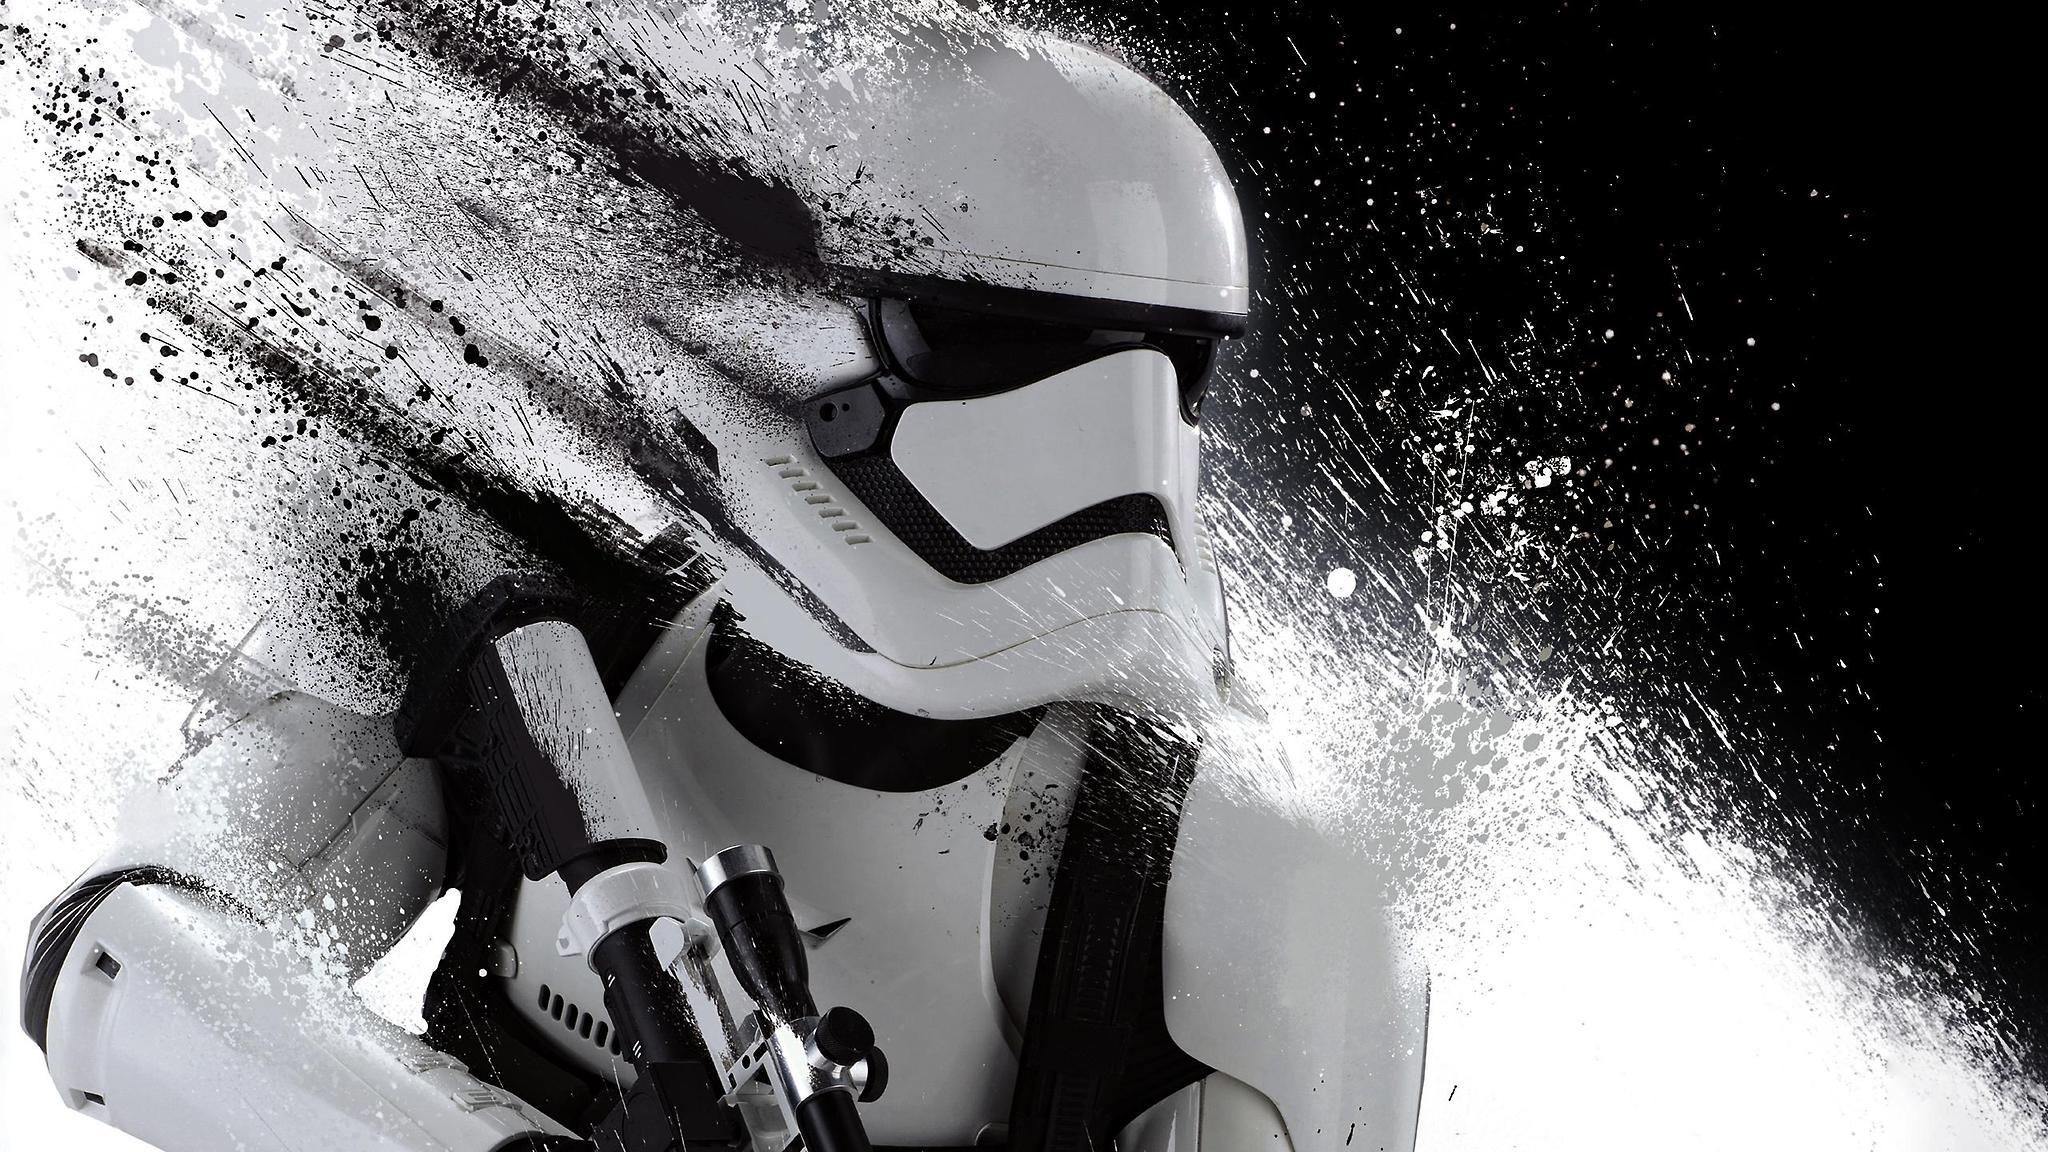 Star Wars Wallpaper On Tumblr